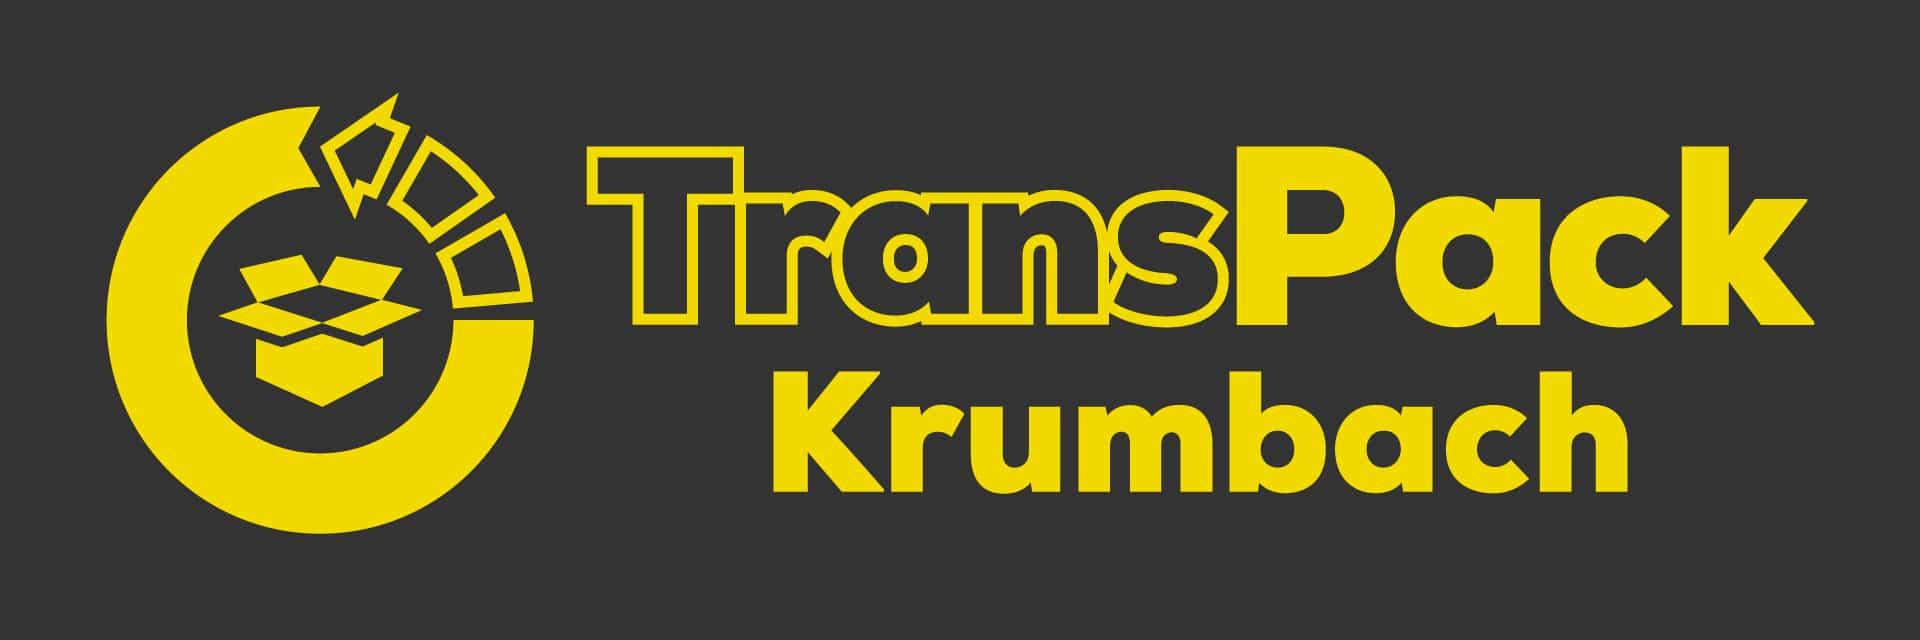 TransPack Krumbach ist ASPION Partner